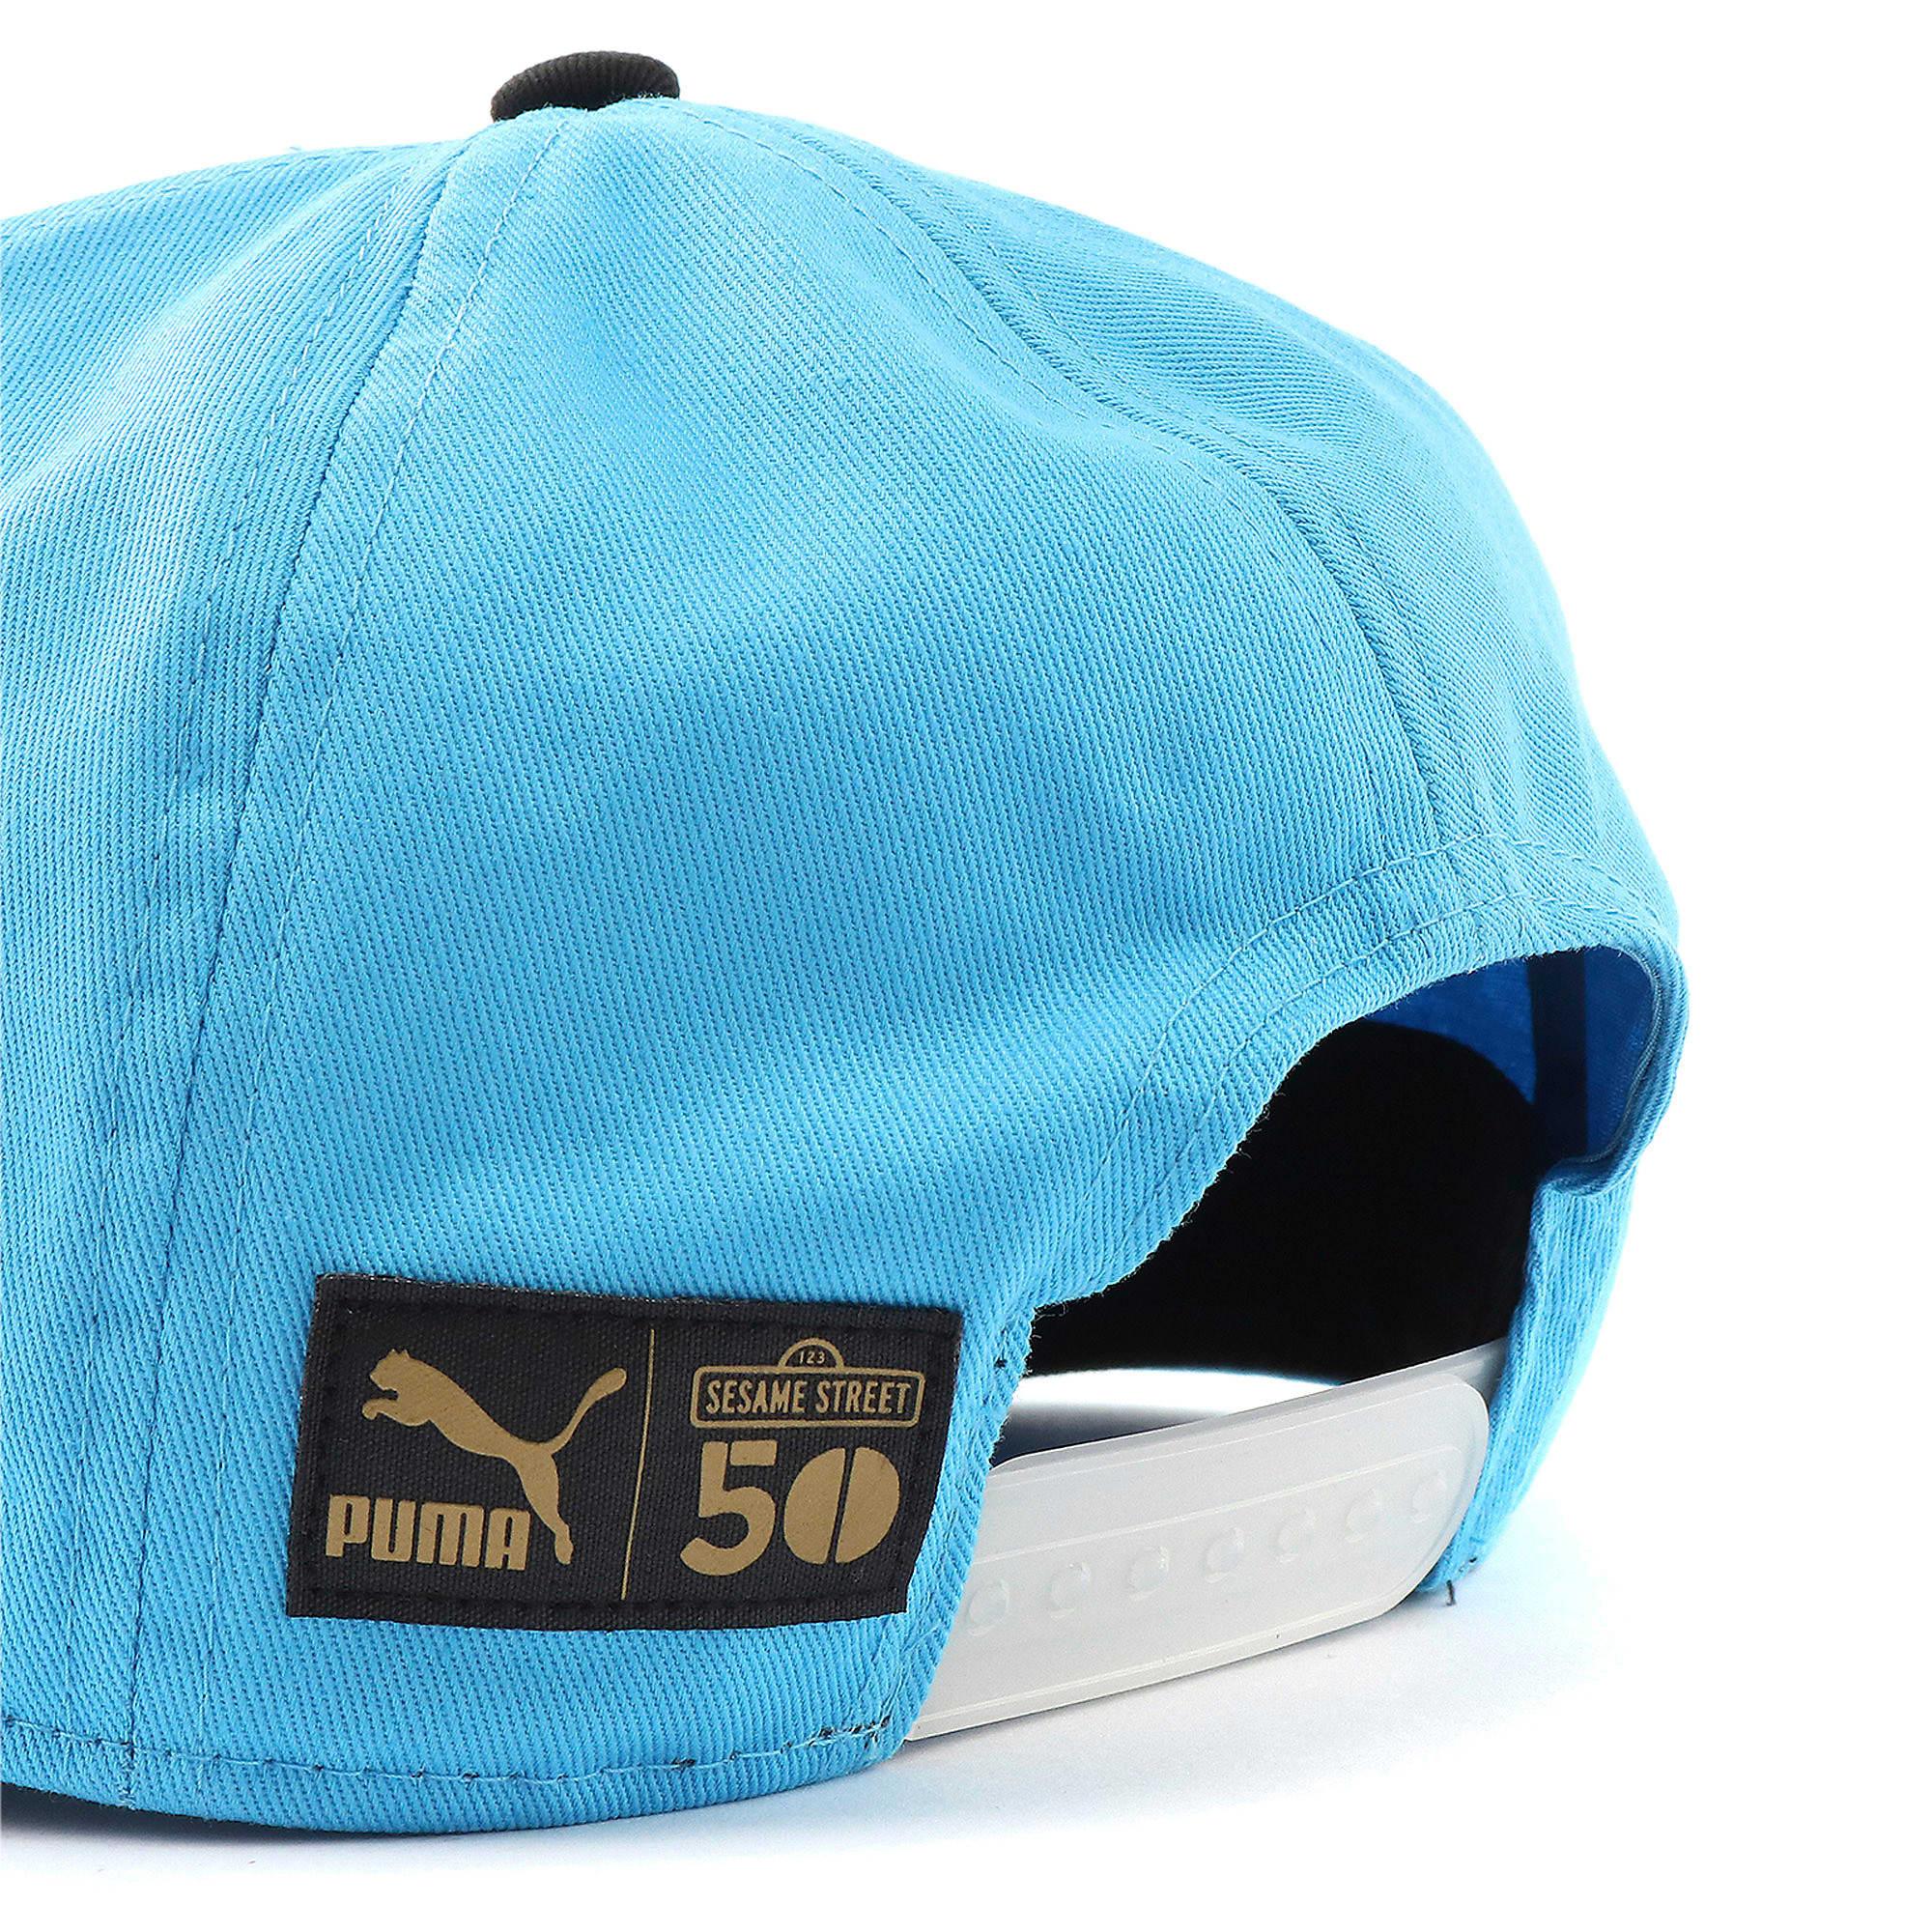 Thumbnail 4 of キッズ セサミストリート FB キャップ, Puma Black-Bleu Azur, medium-JPN